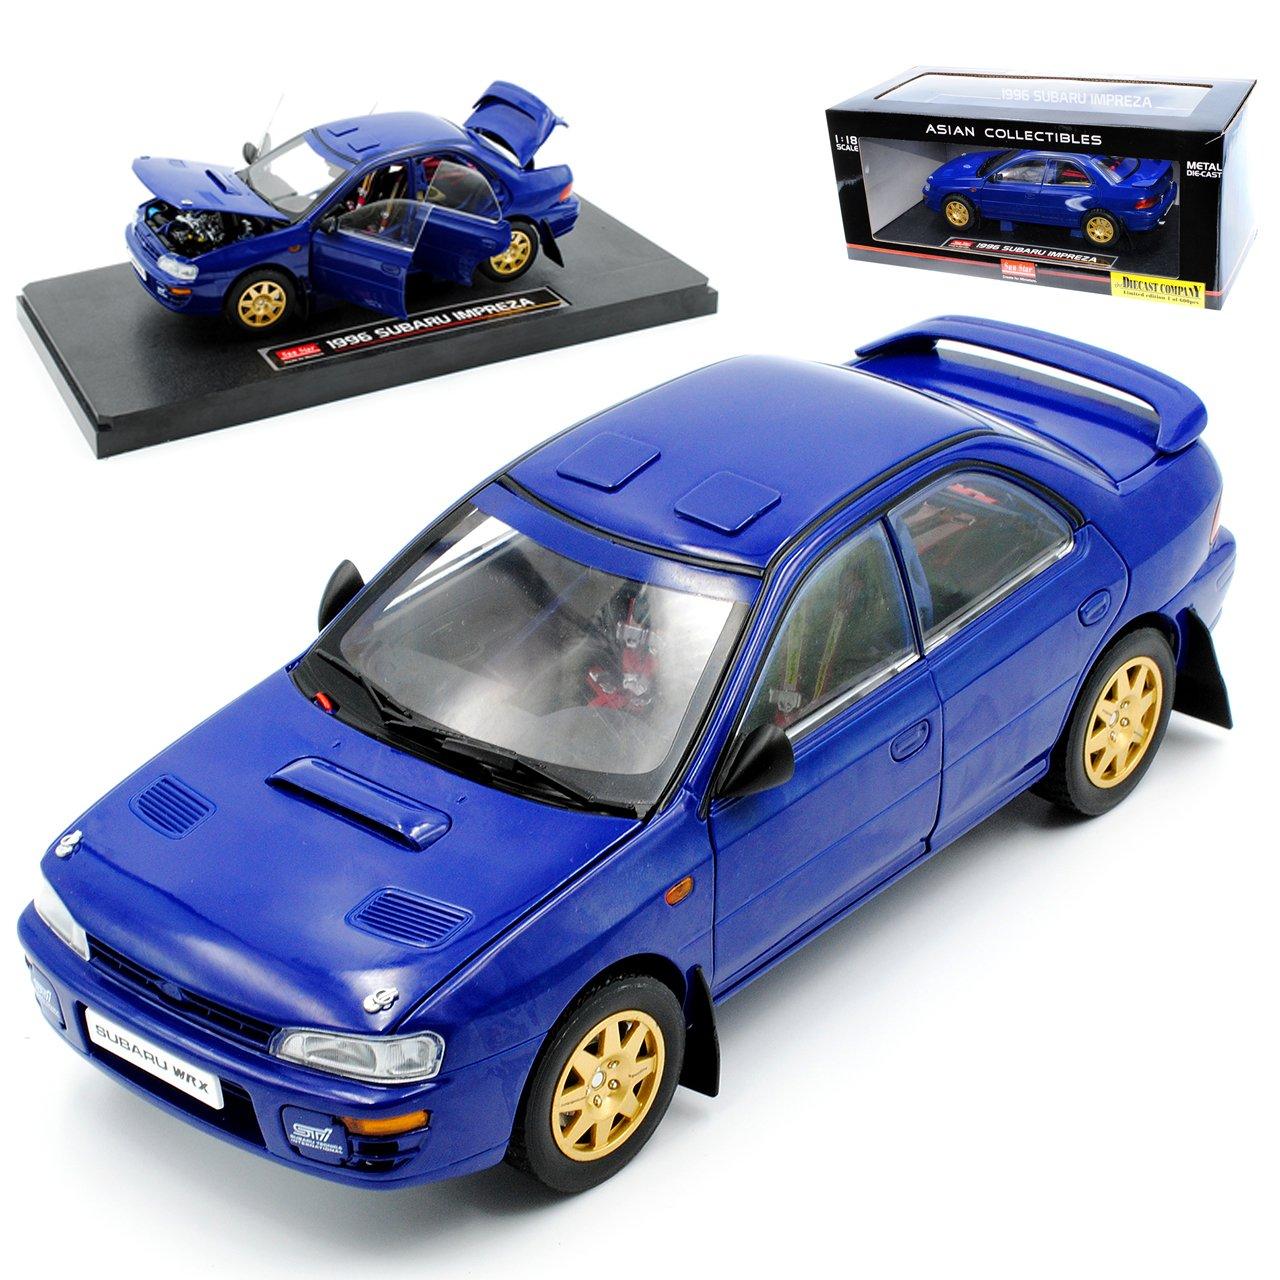 Sun Star Subaru Impreza 1/18 WRX STI Limousine Blau 1996 1/18 Impreza Modell Auto 219595